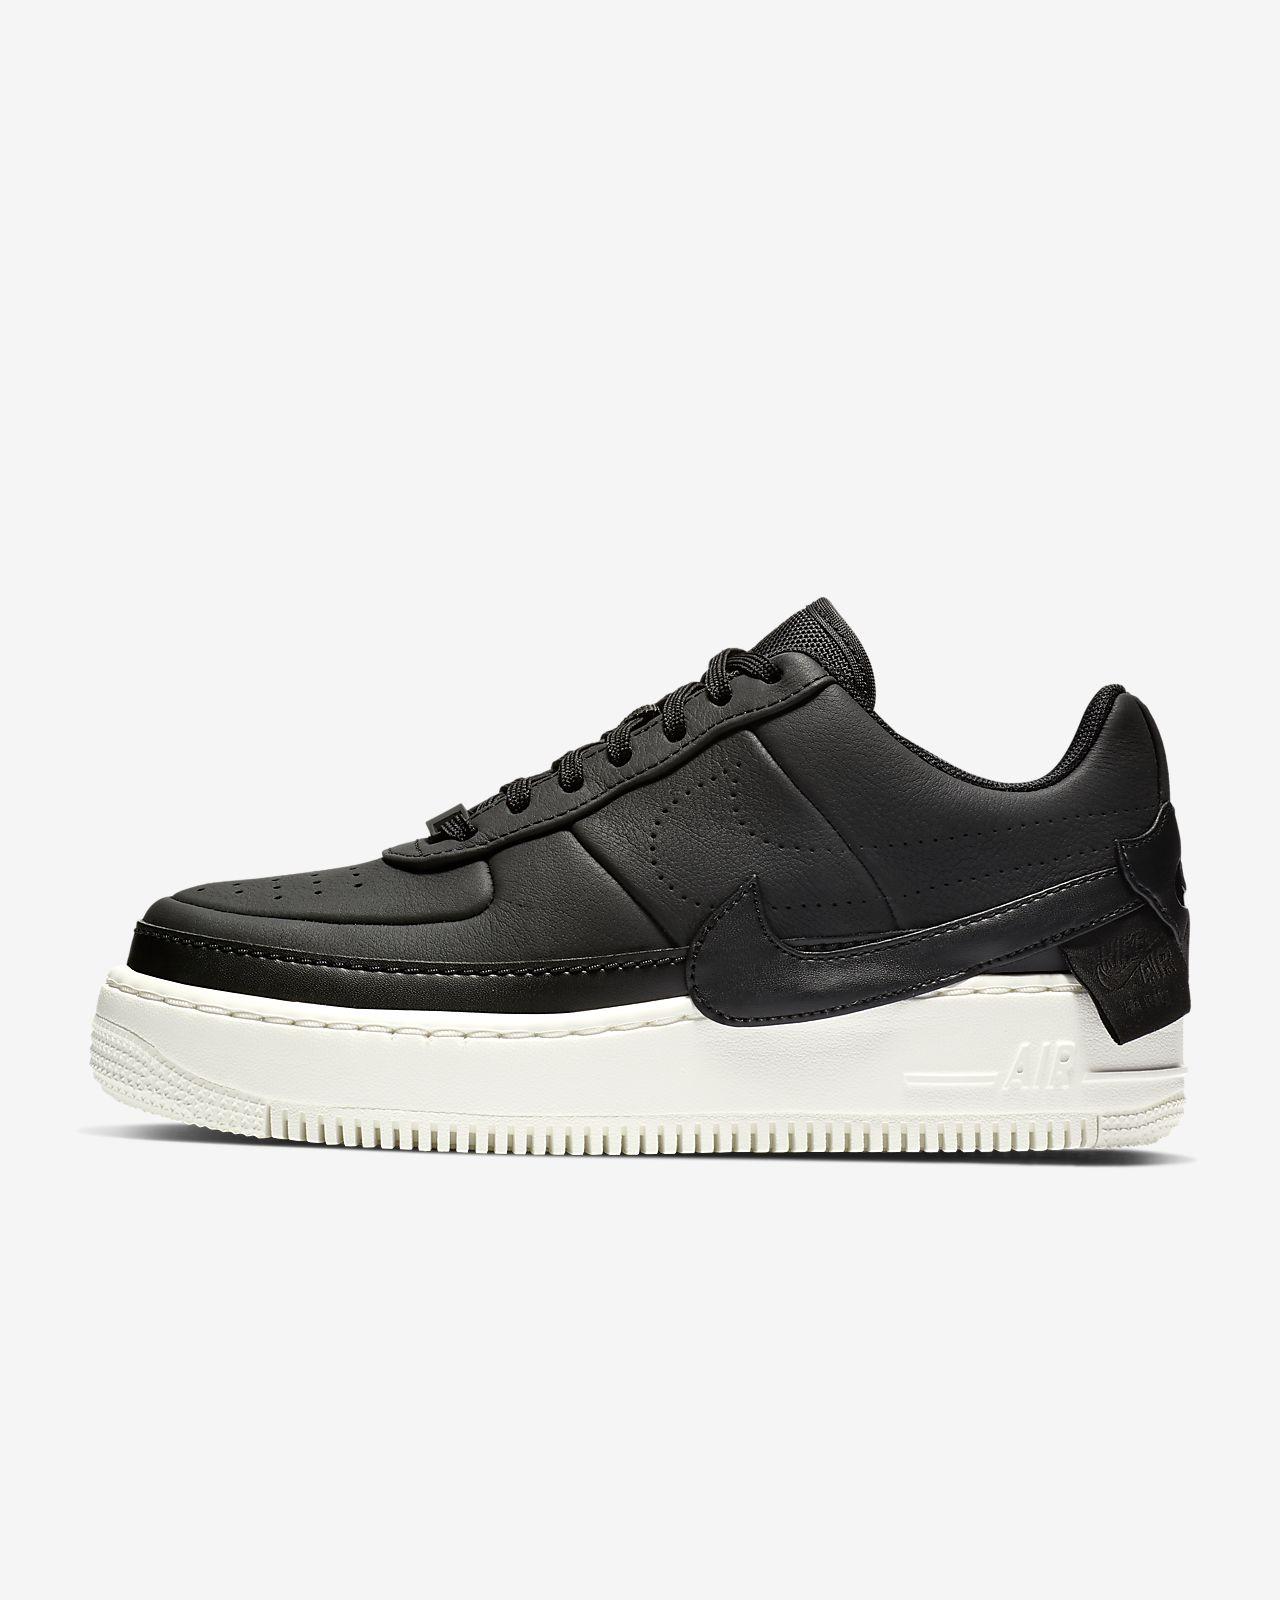 Nike Air Force 1 Jester XX Premium Damenschuh